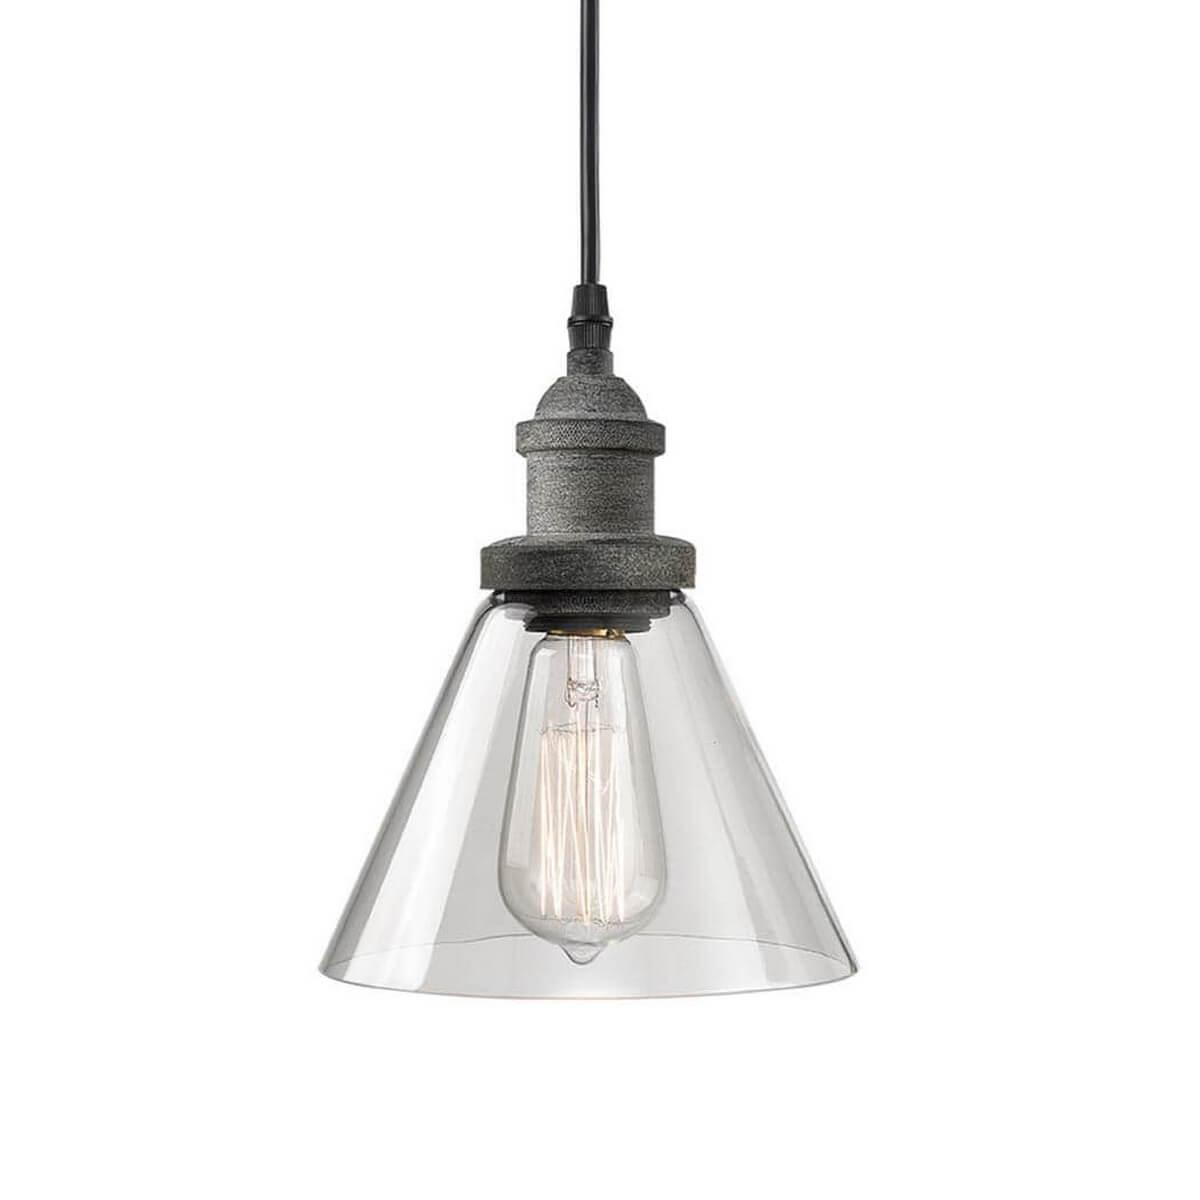 Mini Glass Pendant Lights Rustic Kitchen Island Pendant Lighting